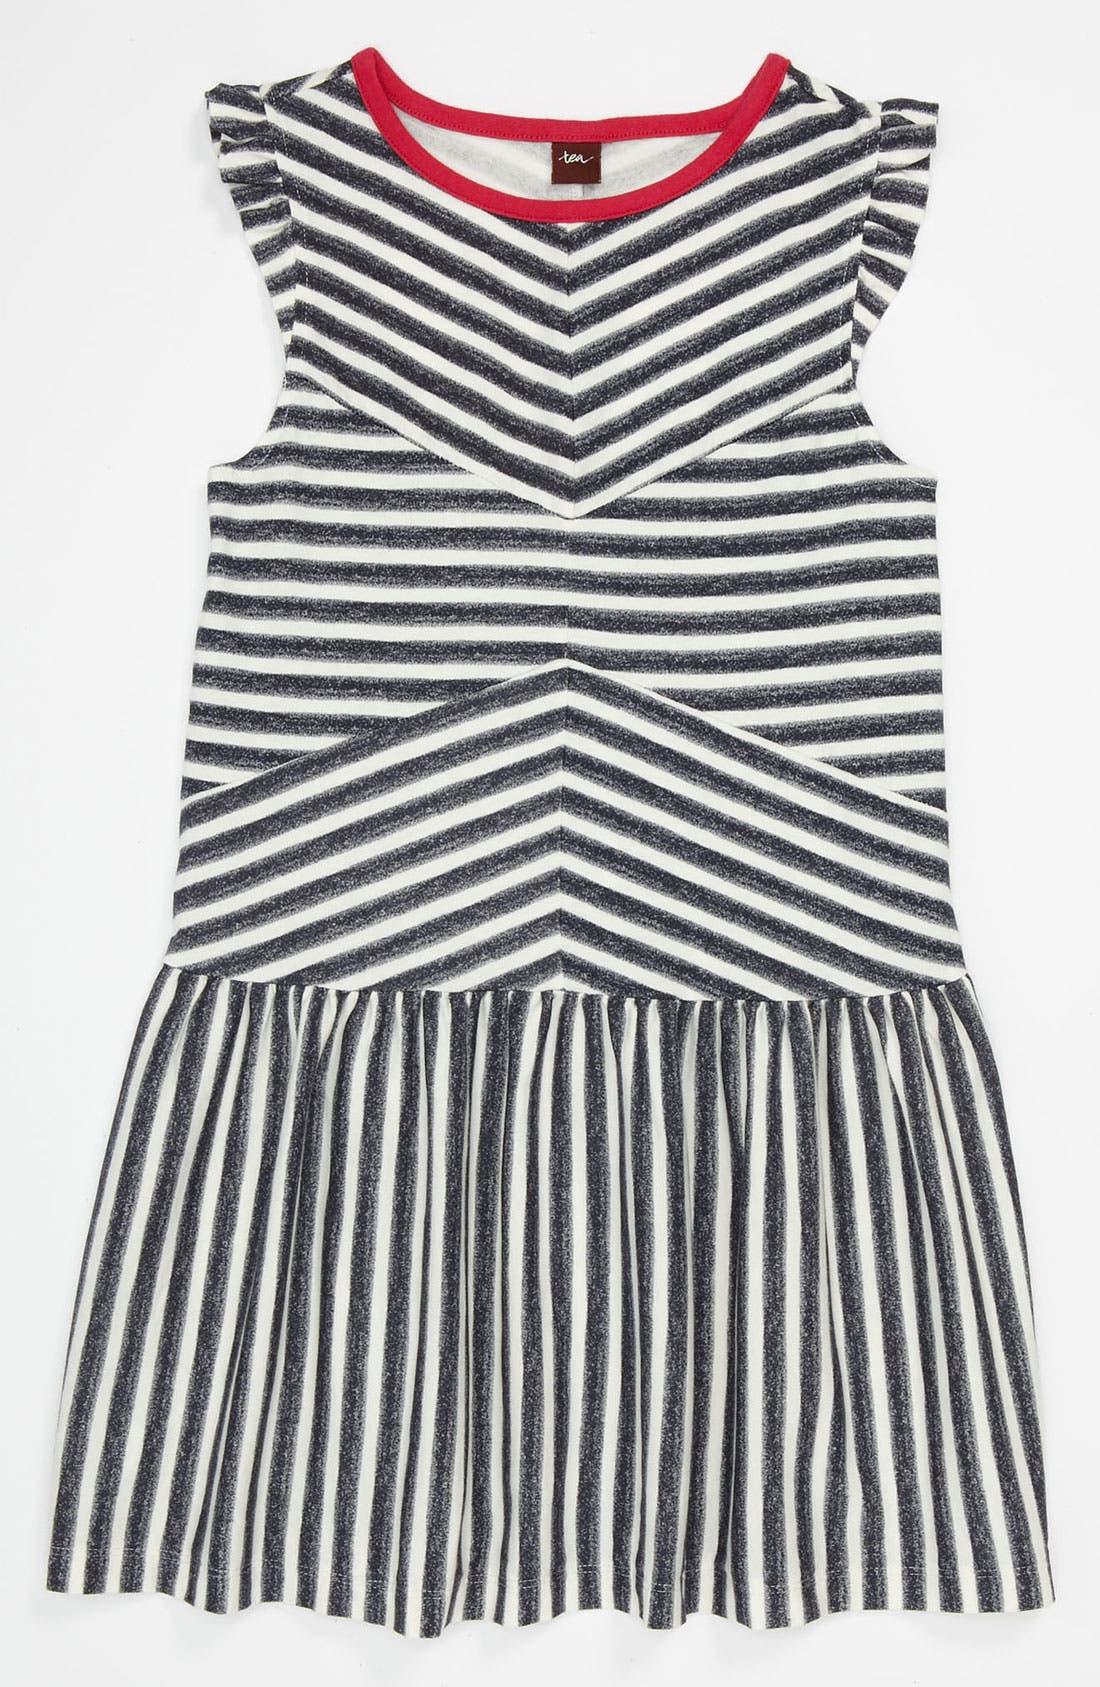 Main Image - Tea Collection 'Zebra Stripe' Flutter Dress (Toddler, Little Girls & Big Girls)